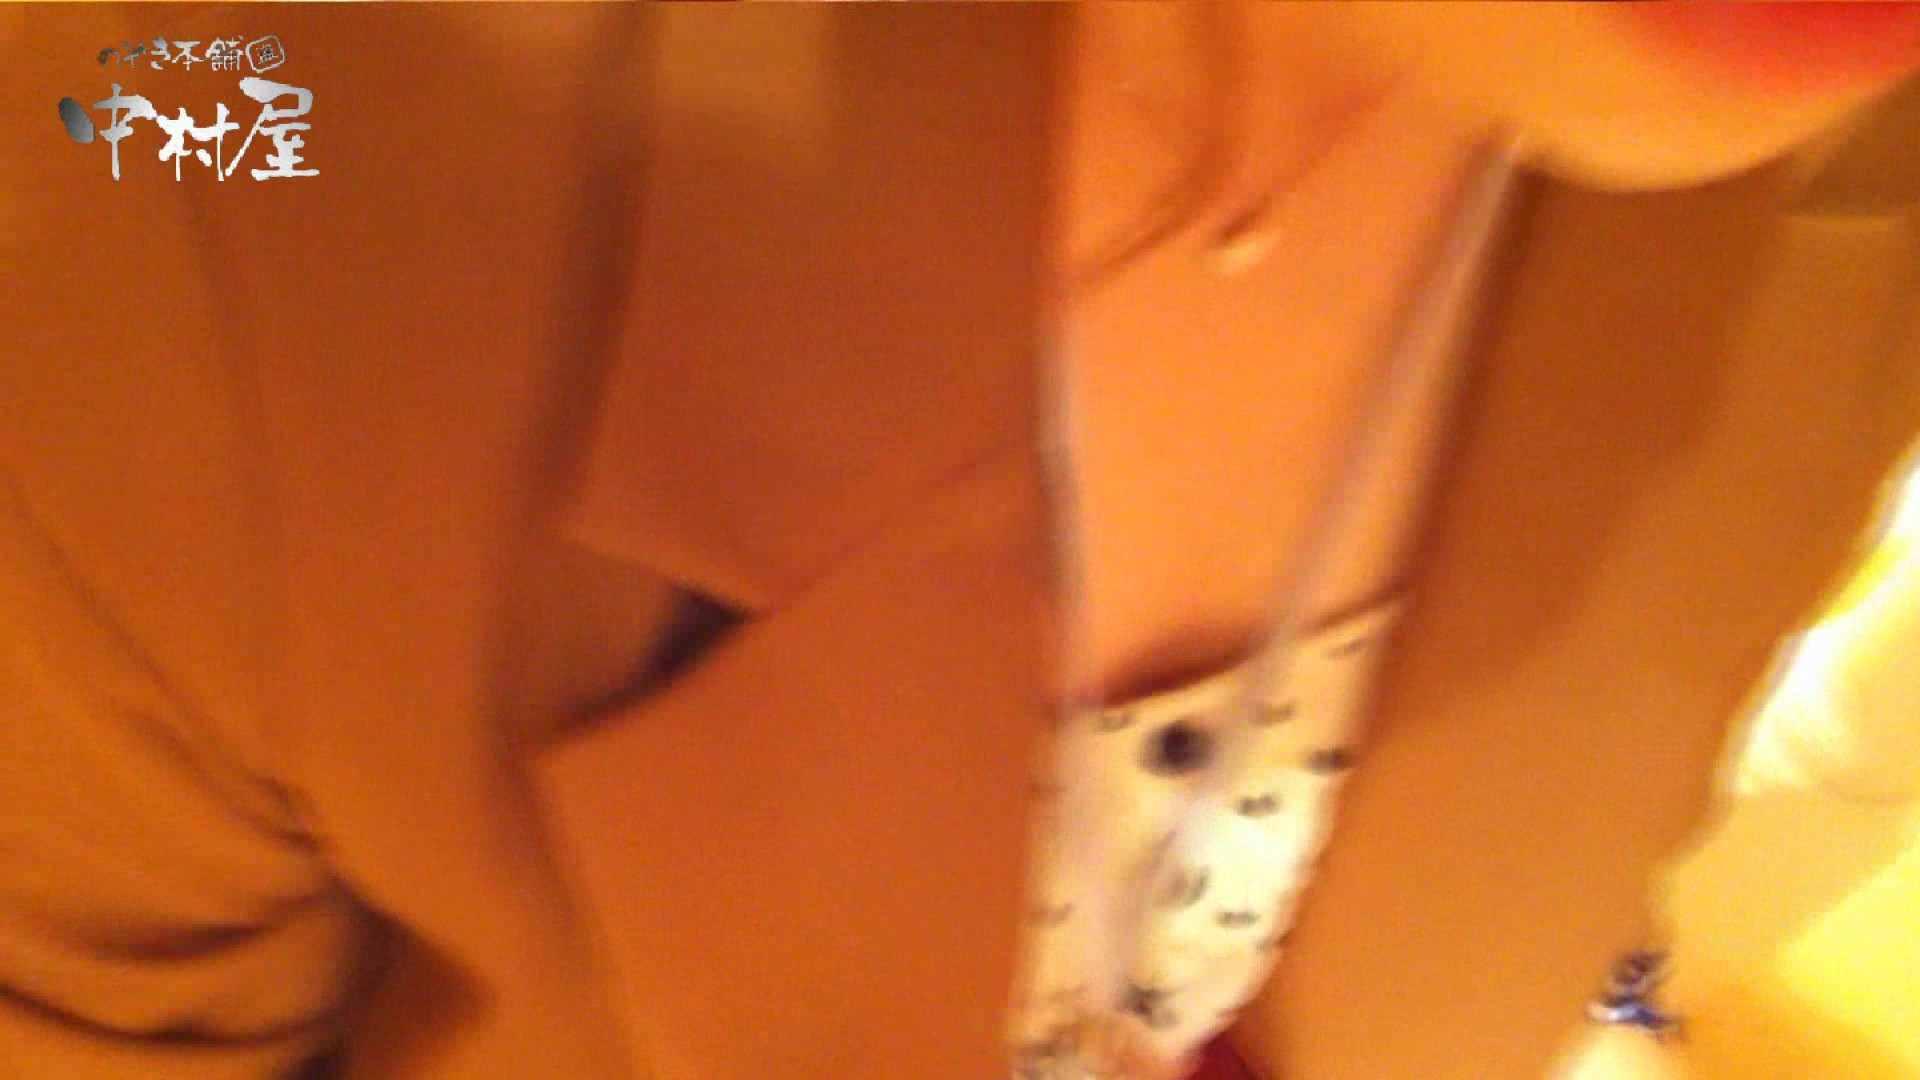 vol.45 可愛いカリスマ店員限定‼胸チラ&パンチラ 食い込みミッキーマウス! 胸チラ  103画像 78